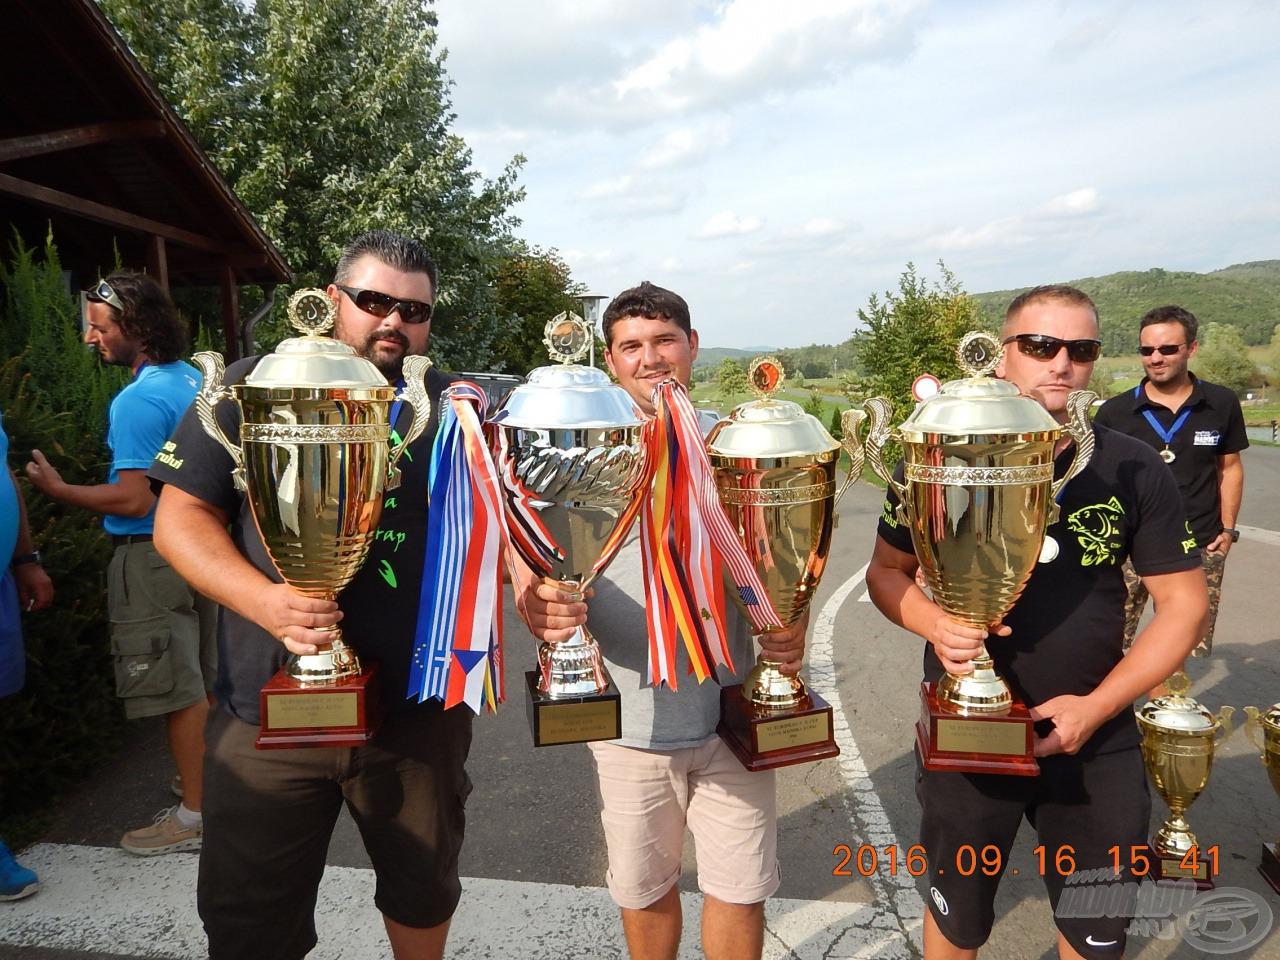 Professzionális Bojlis Európa Kupa,  Maconka: Napról-napra